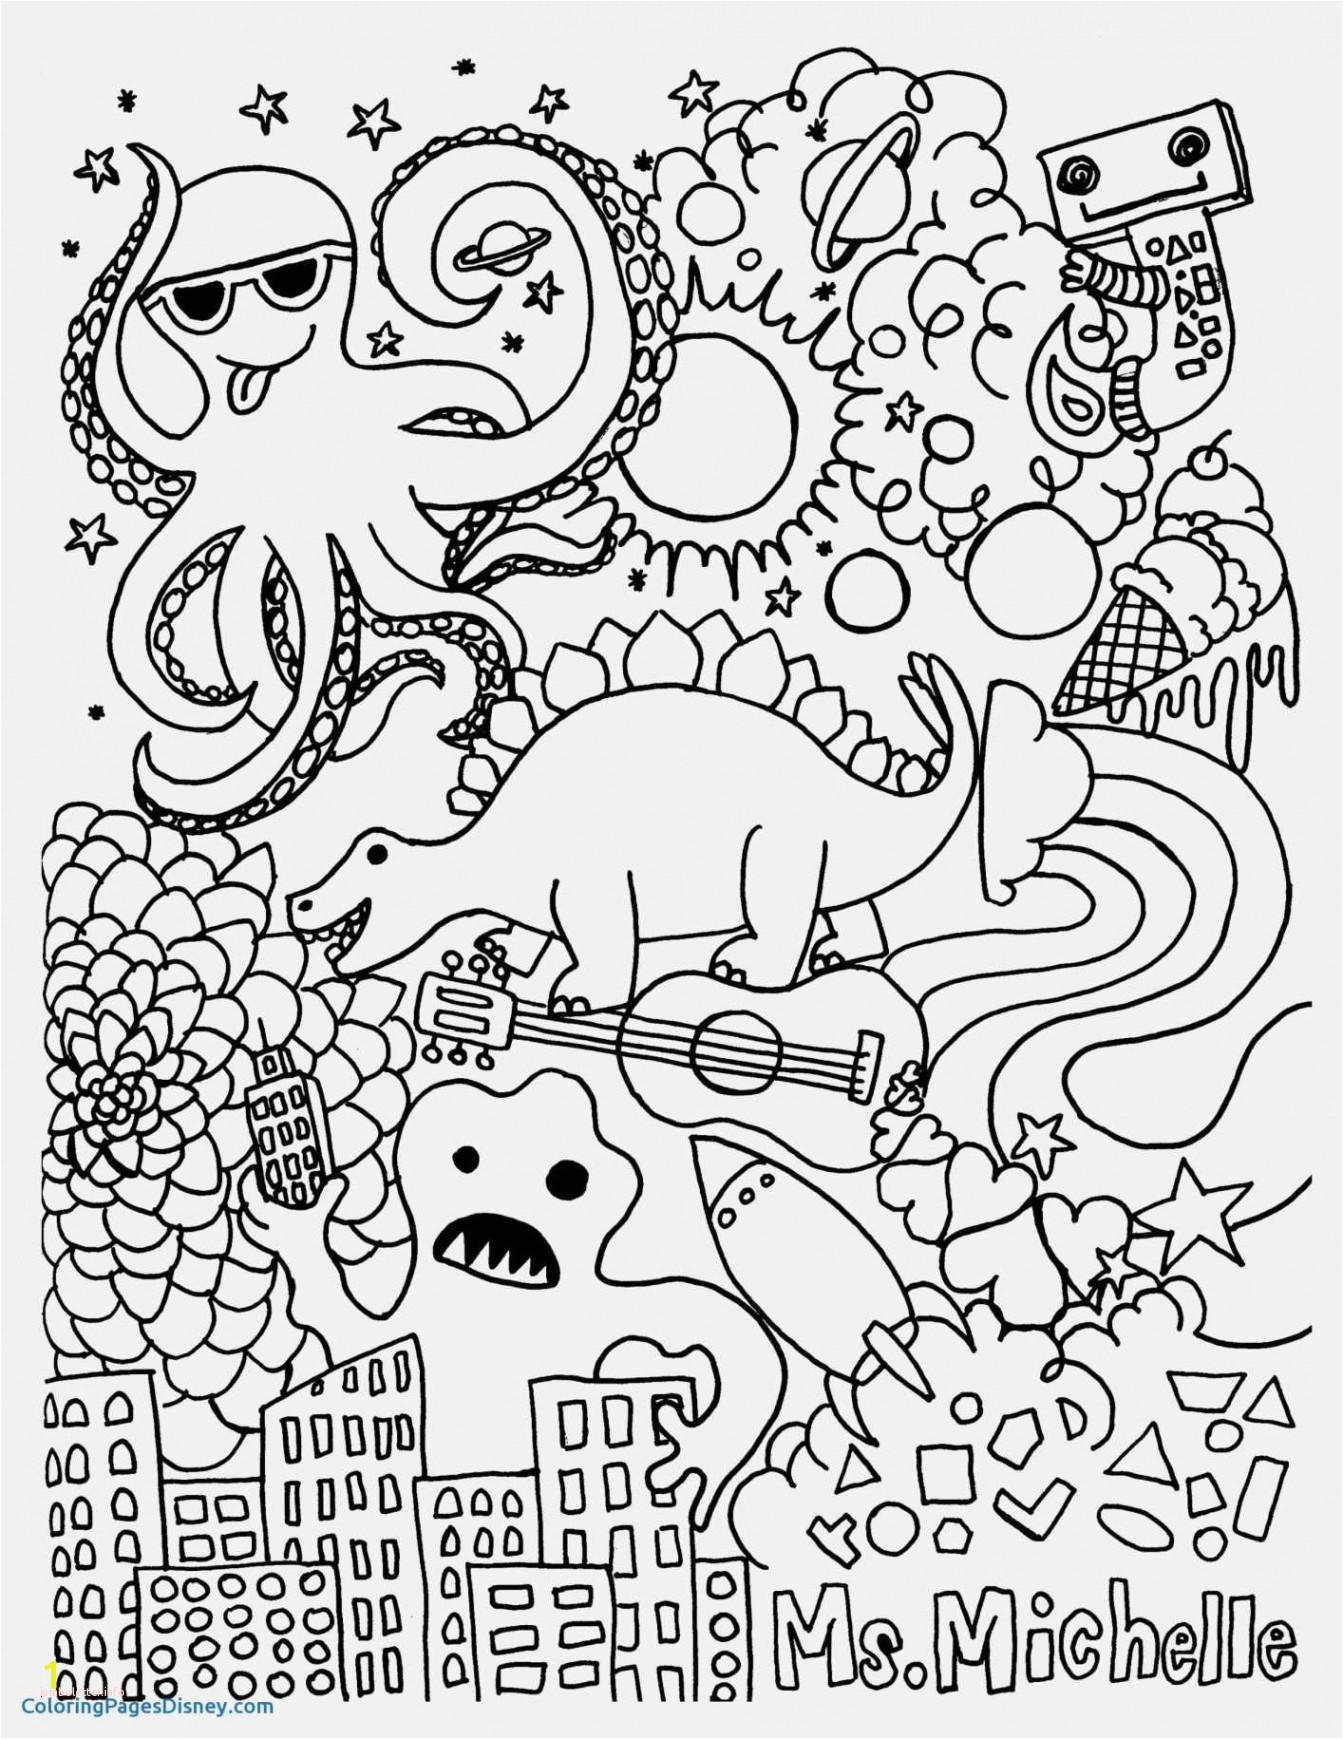 B Daman Coloring Pages B Daman Coloring Pages Coloring Pages Coloring Pages